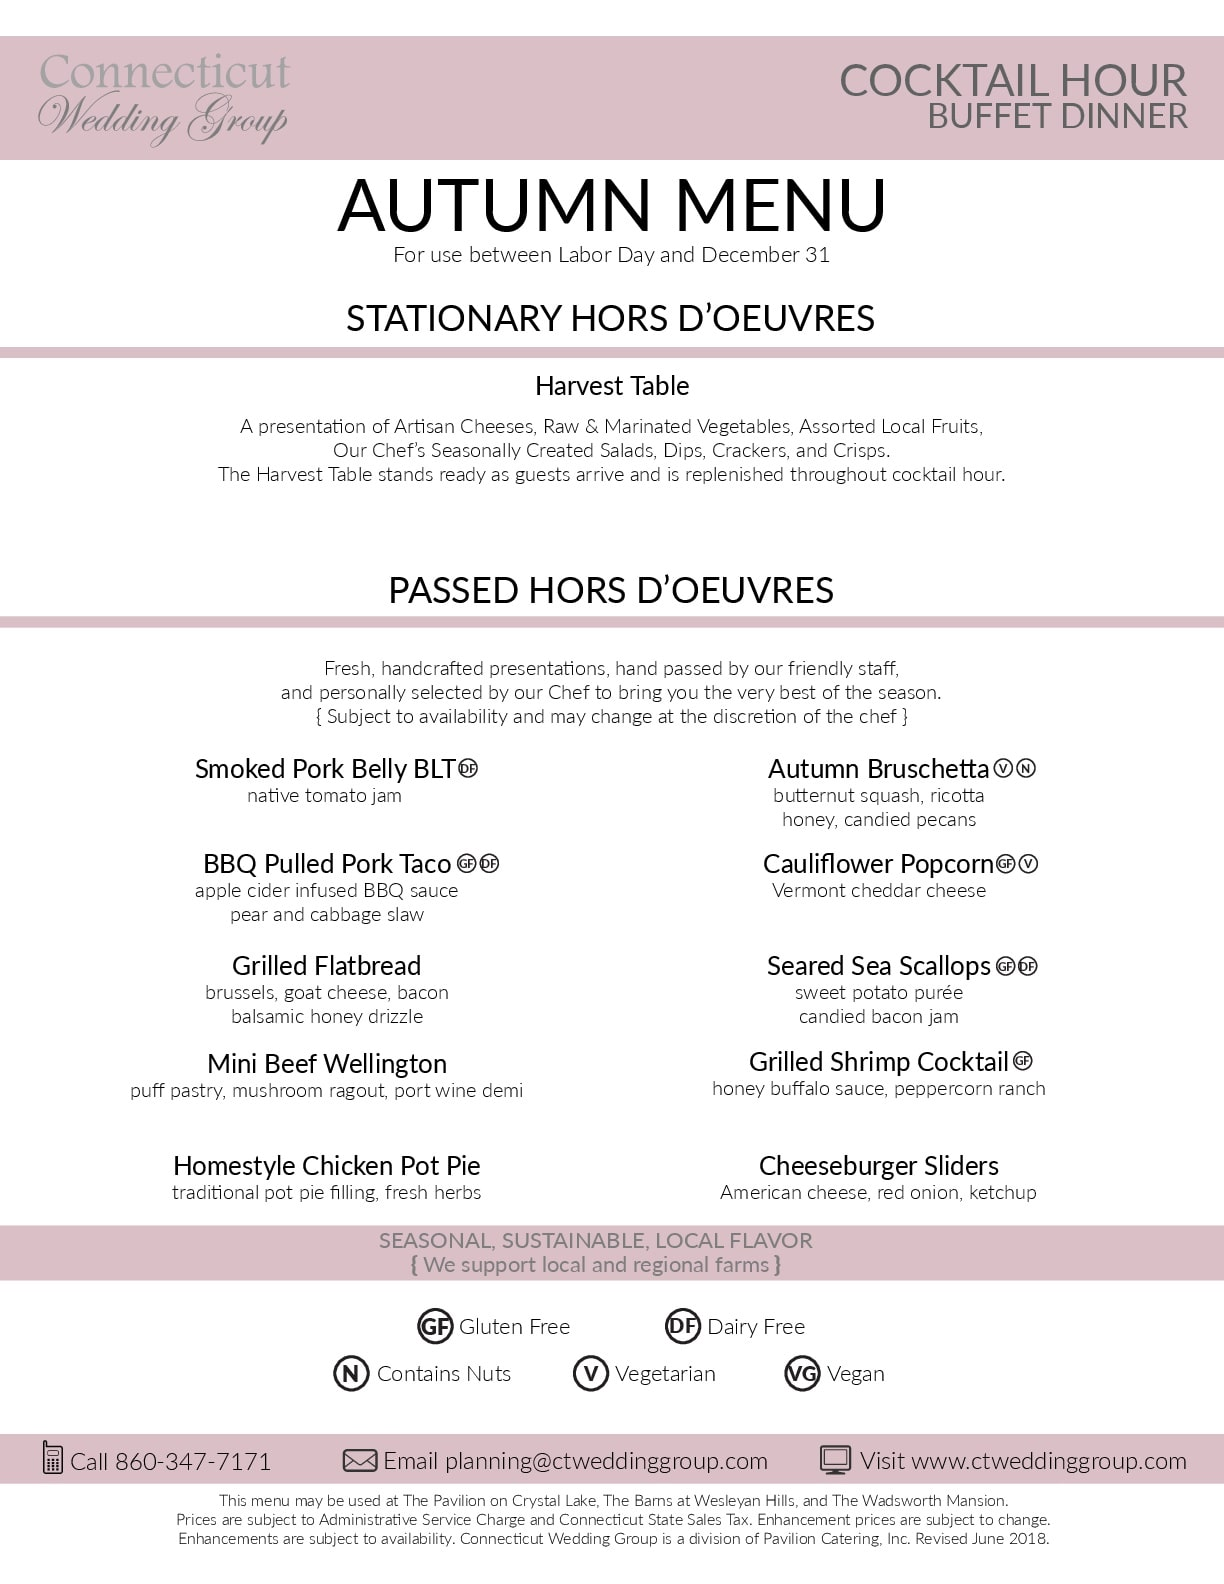 Autumn-Buffet-Menu_2019-Maroon-Website-Version-001-min